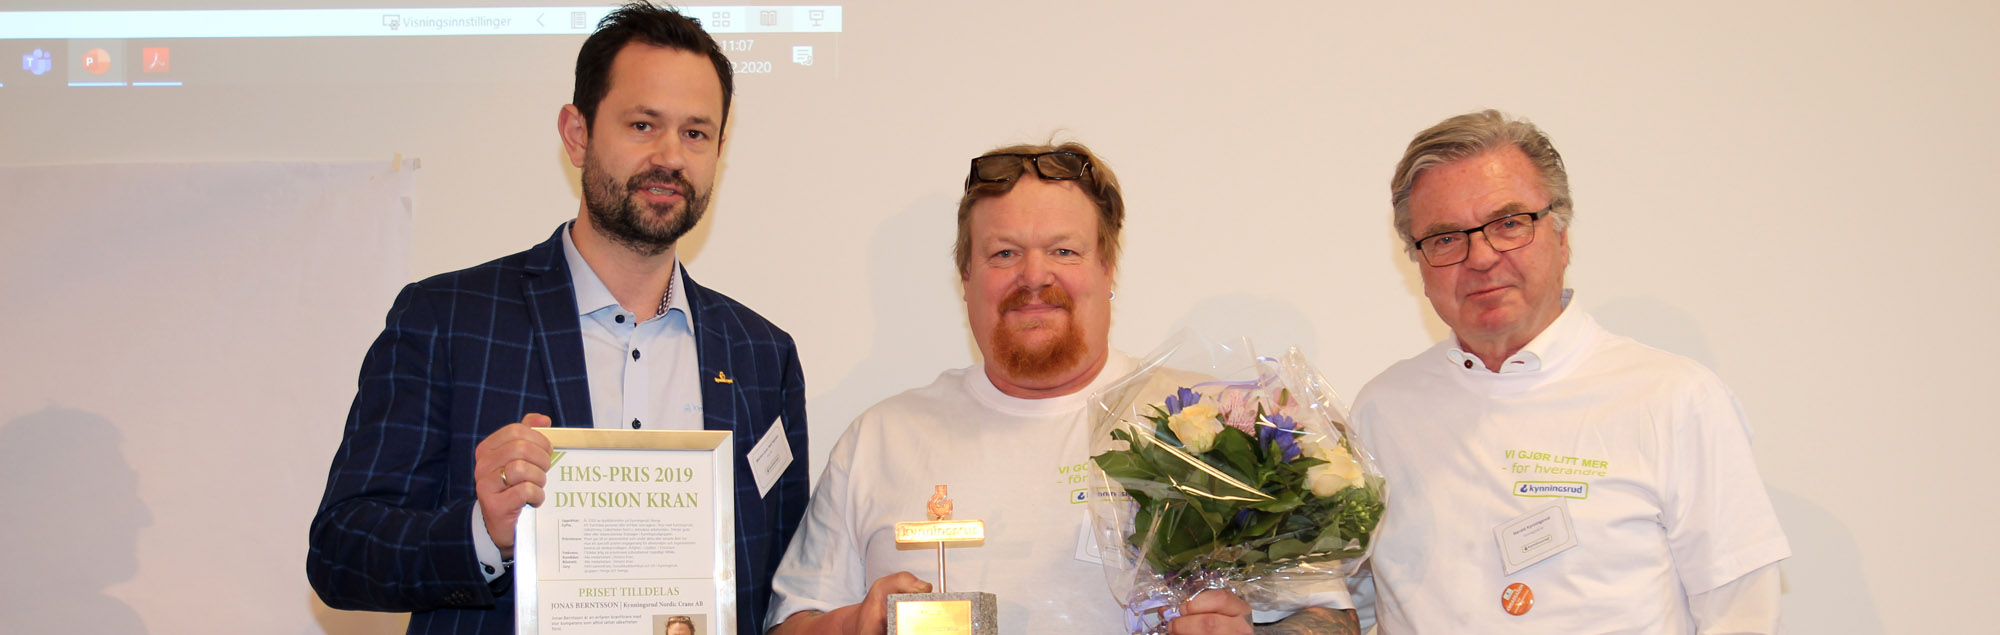 HMS-priset 2019 till Jonas Berntsson